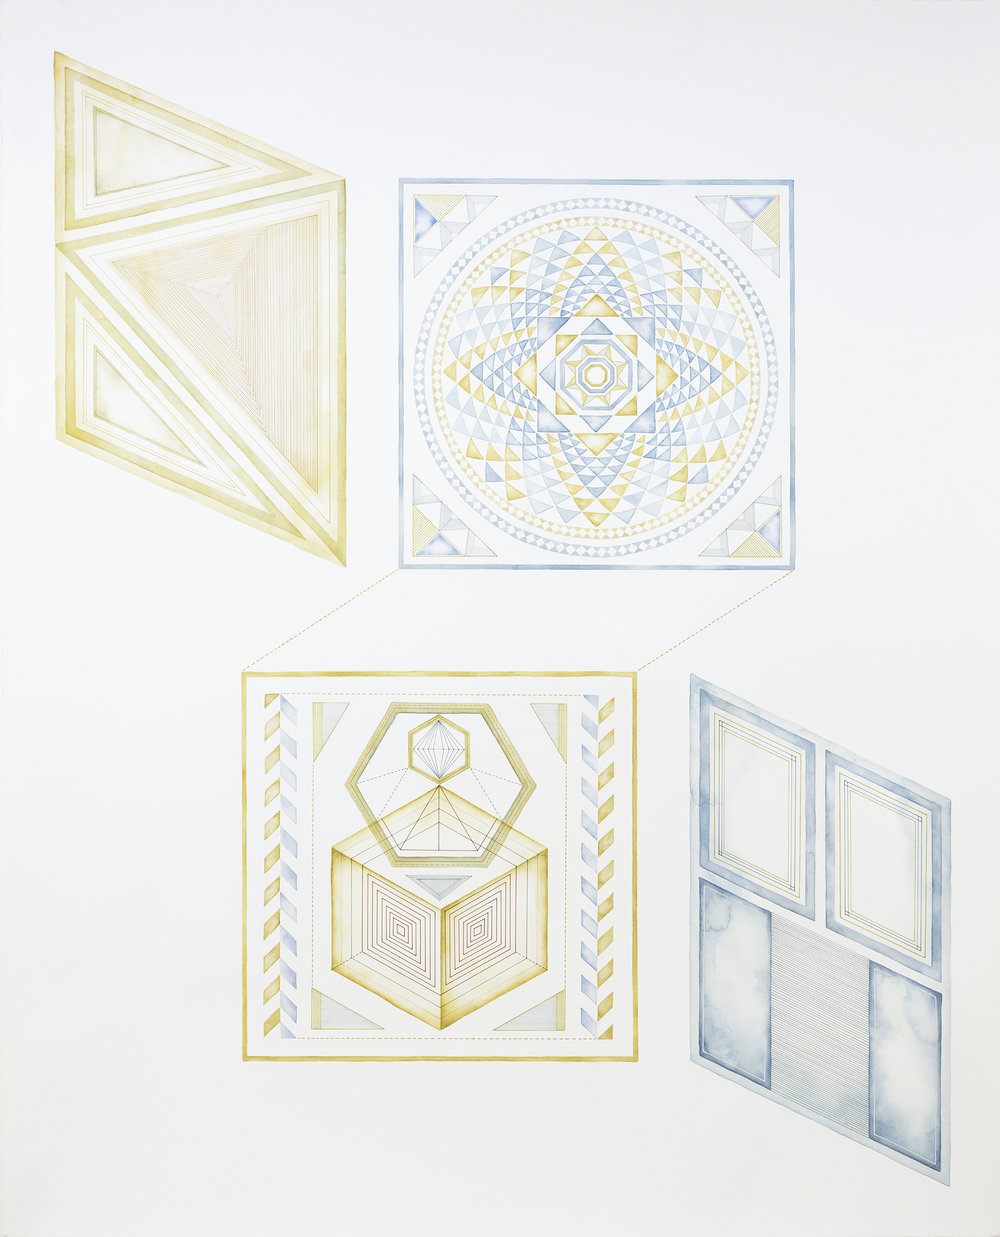 Yuria Okamura, Wander 1 , 2015, acrylic and ink on paper, 120 x 96 cm